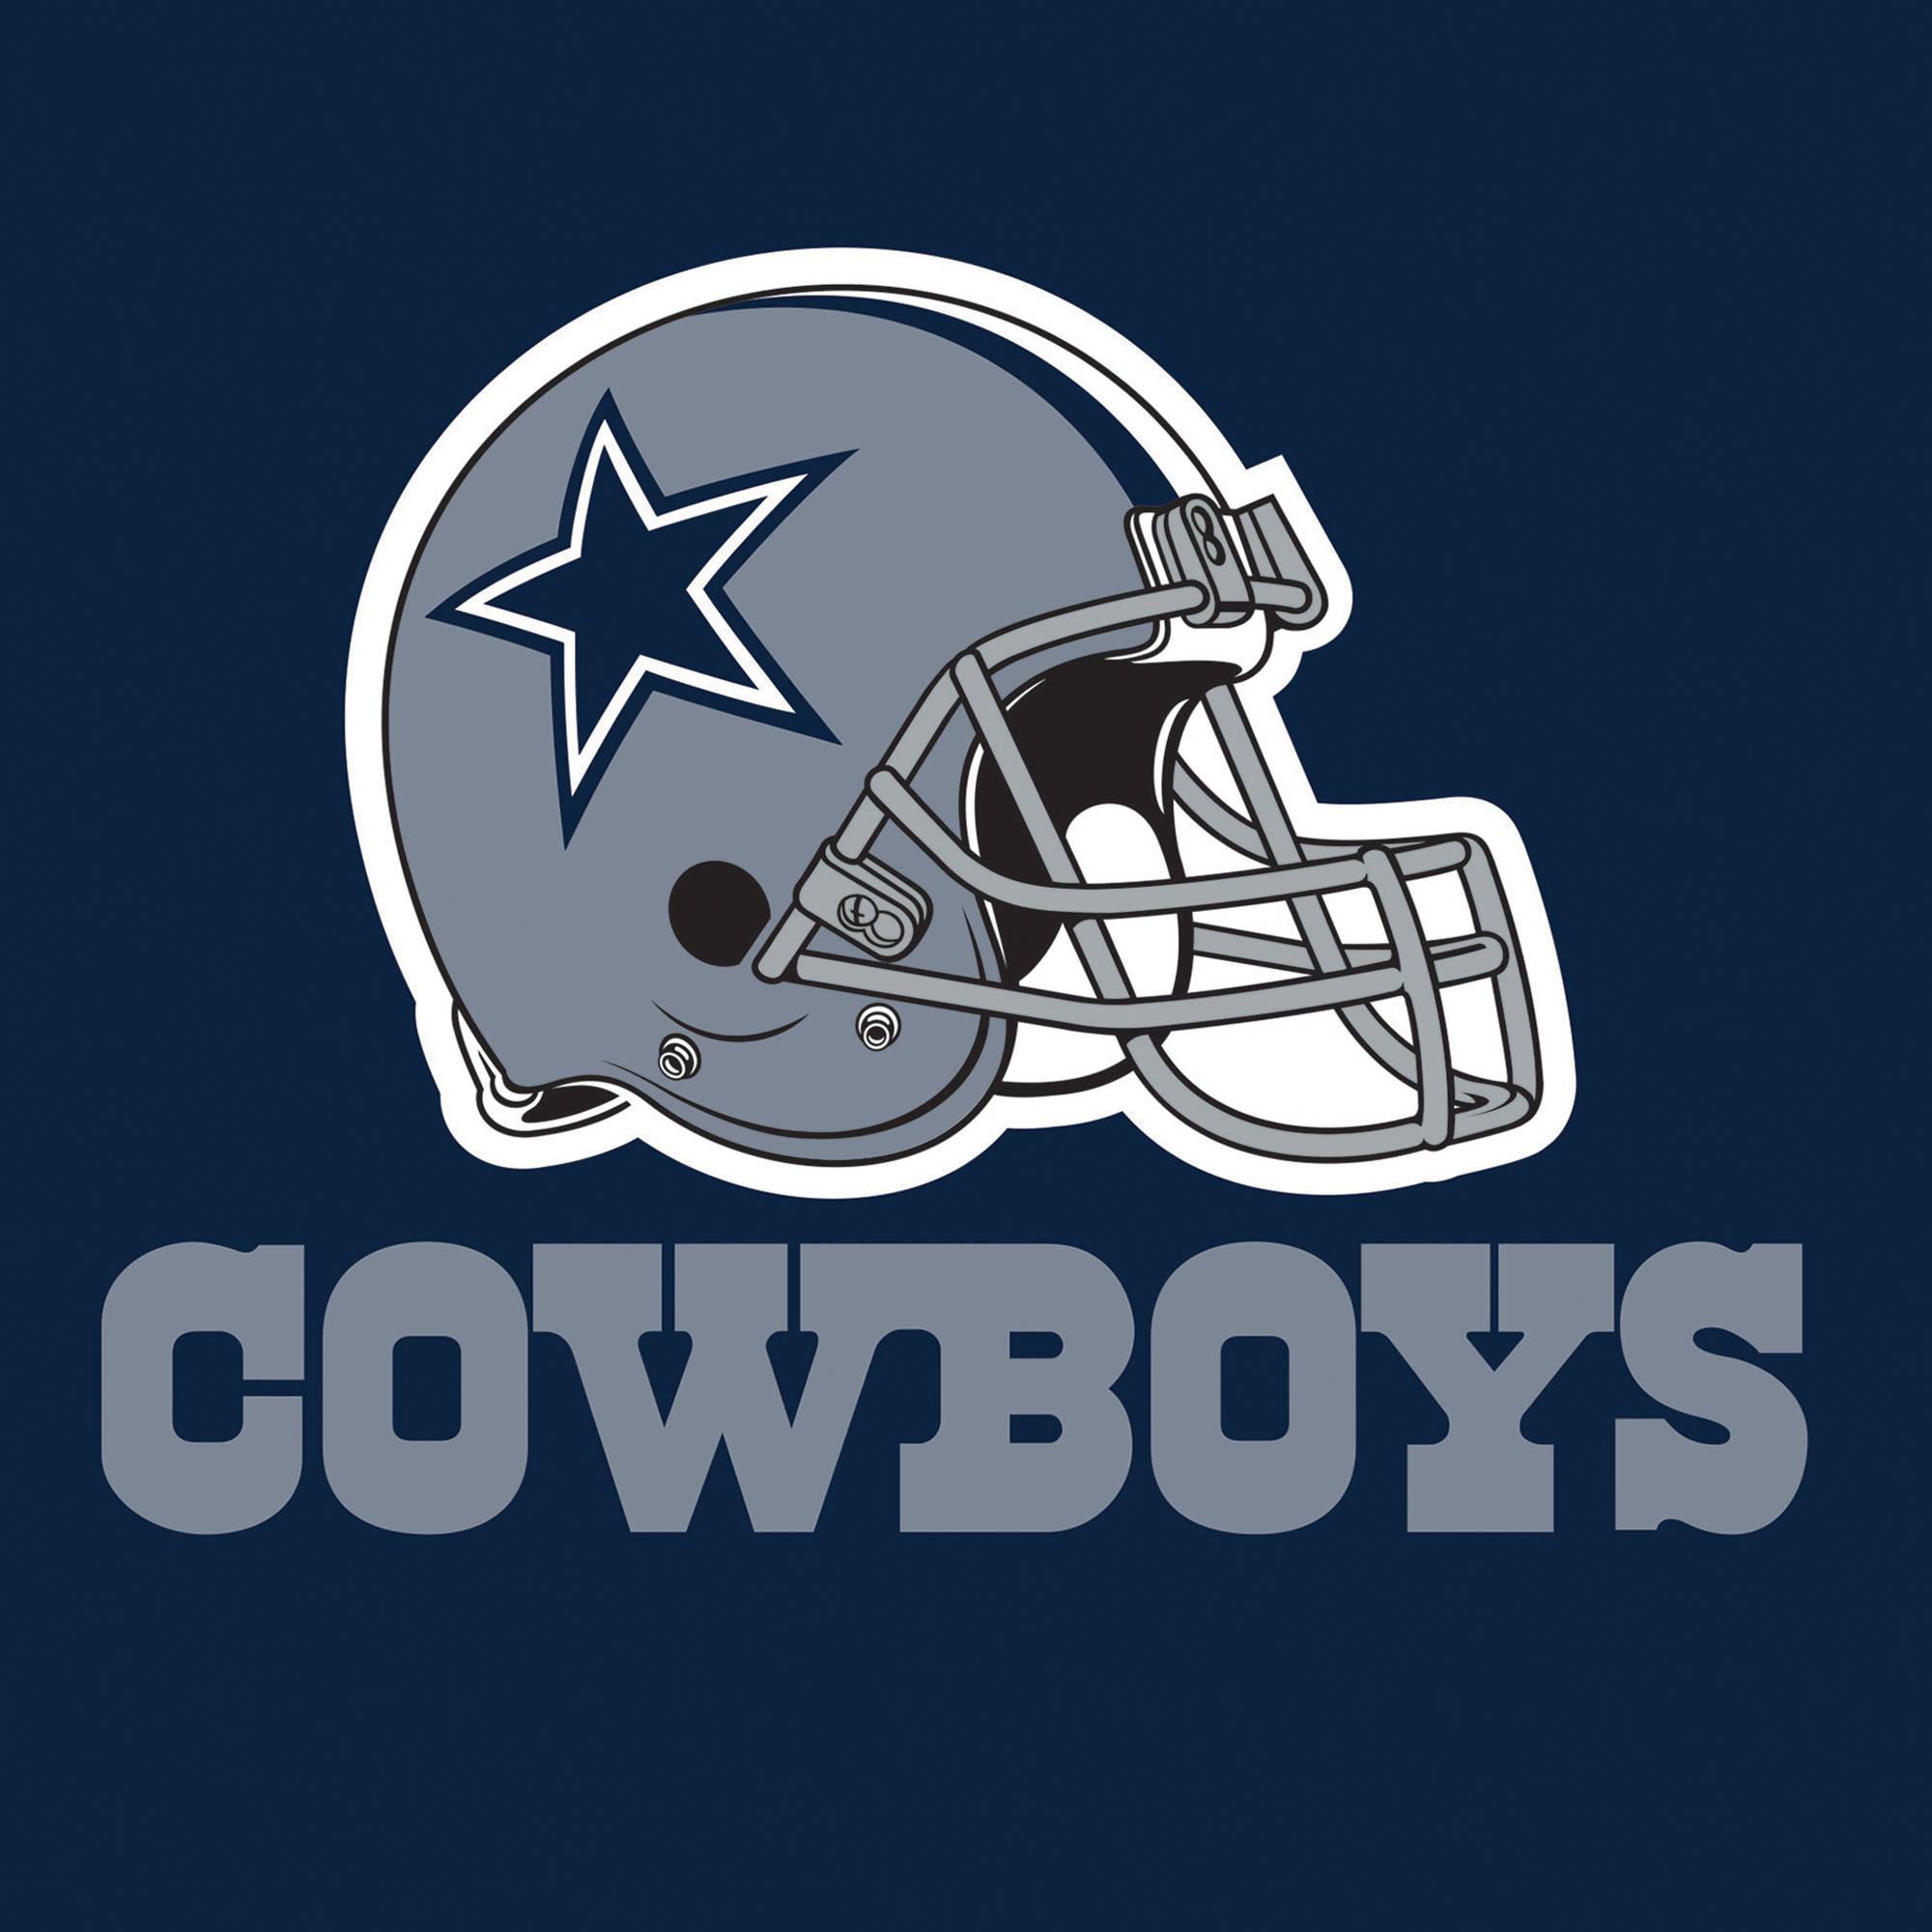 Dallas Cowboys Wallpaper Free